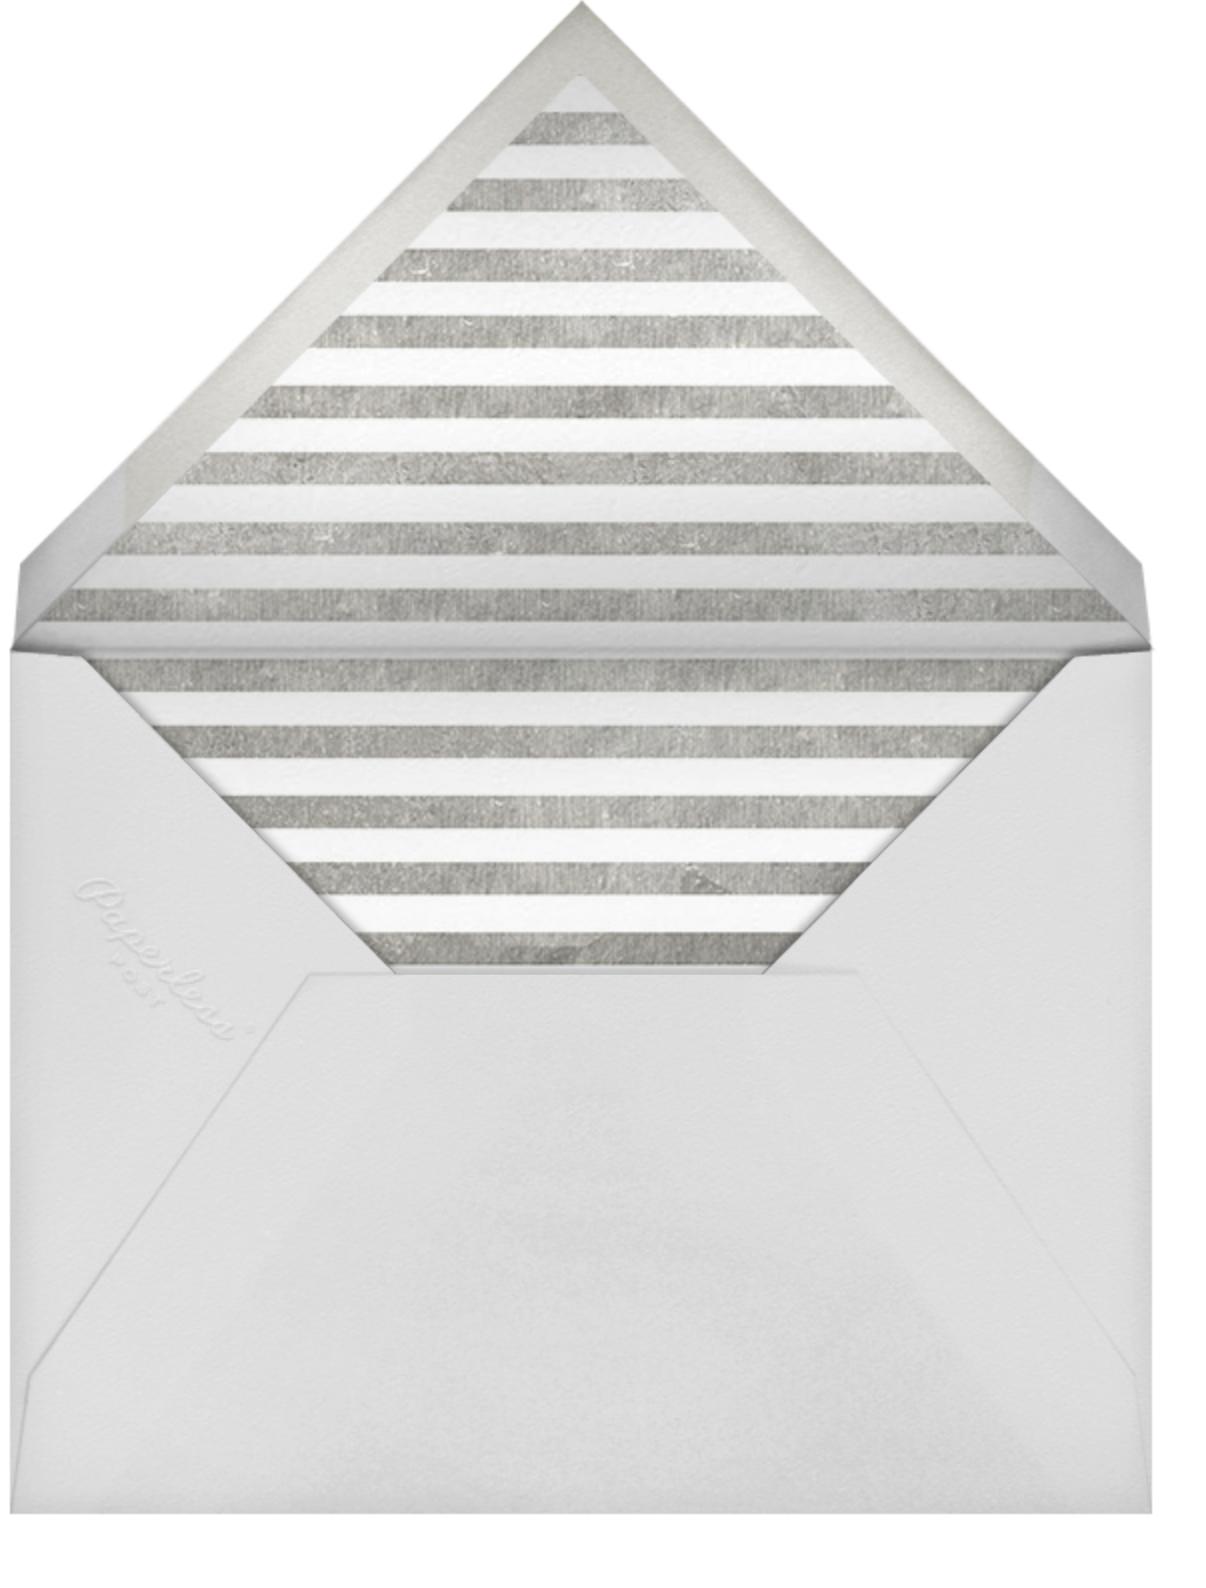 Confetti (Invitation) - White/Silver - kate spade new york - All - envelope back